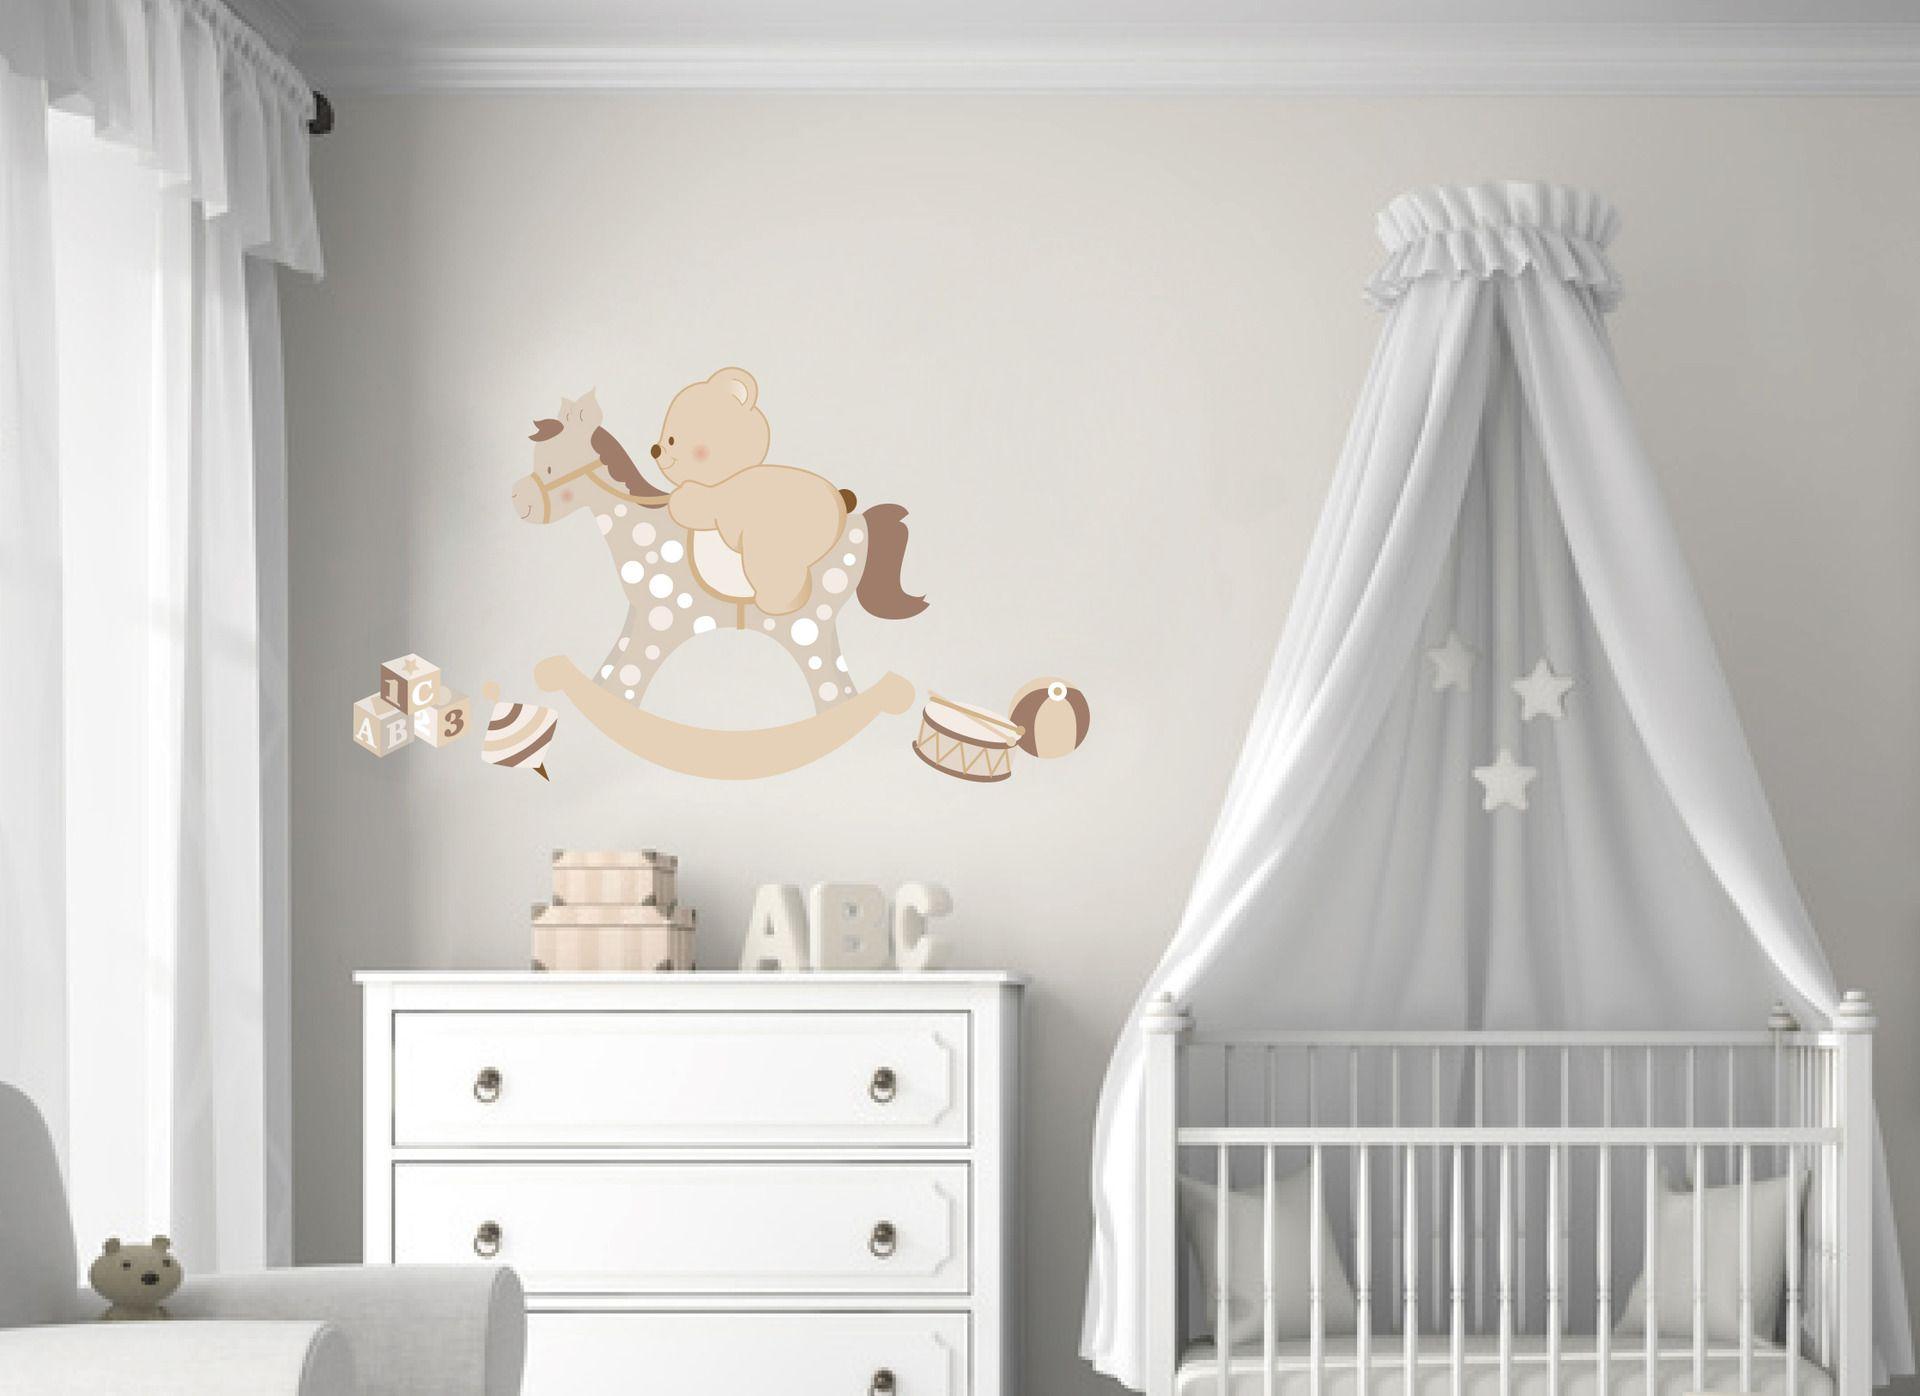 Disegni Cameretta ~ Dipingere cameretta bambino. affordable perfect idee per camere